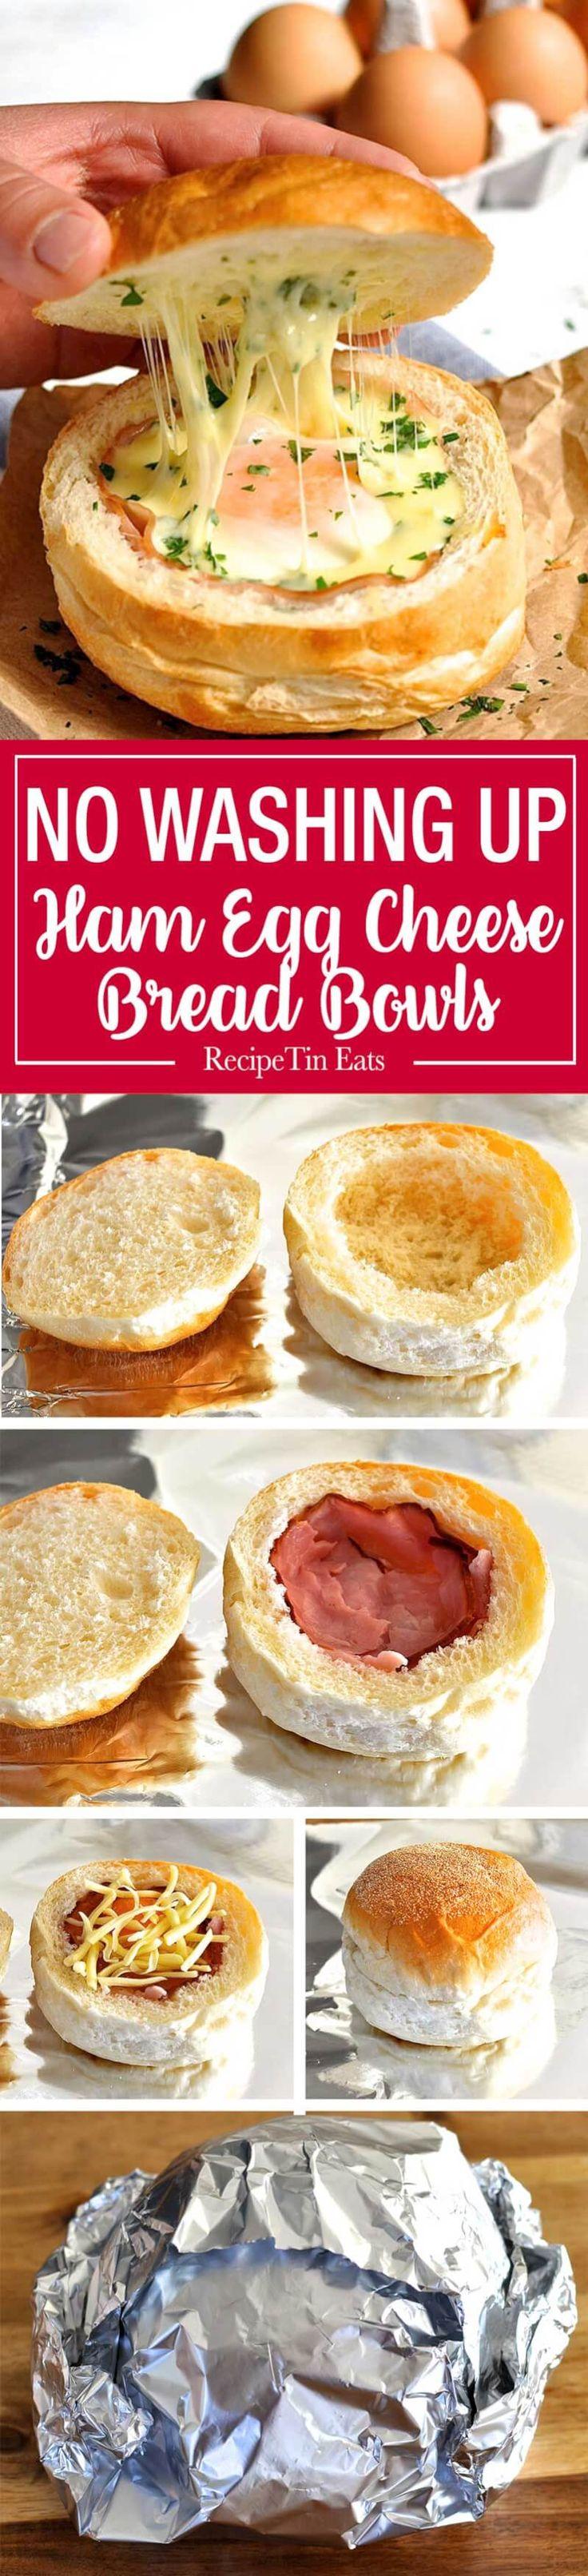 No Washing Up Ham Egg Cheese Bread Bowls www.recipetineats.com